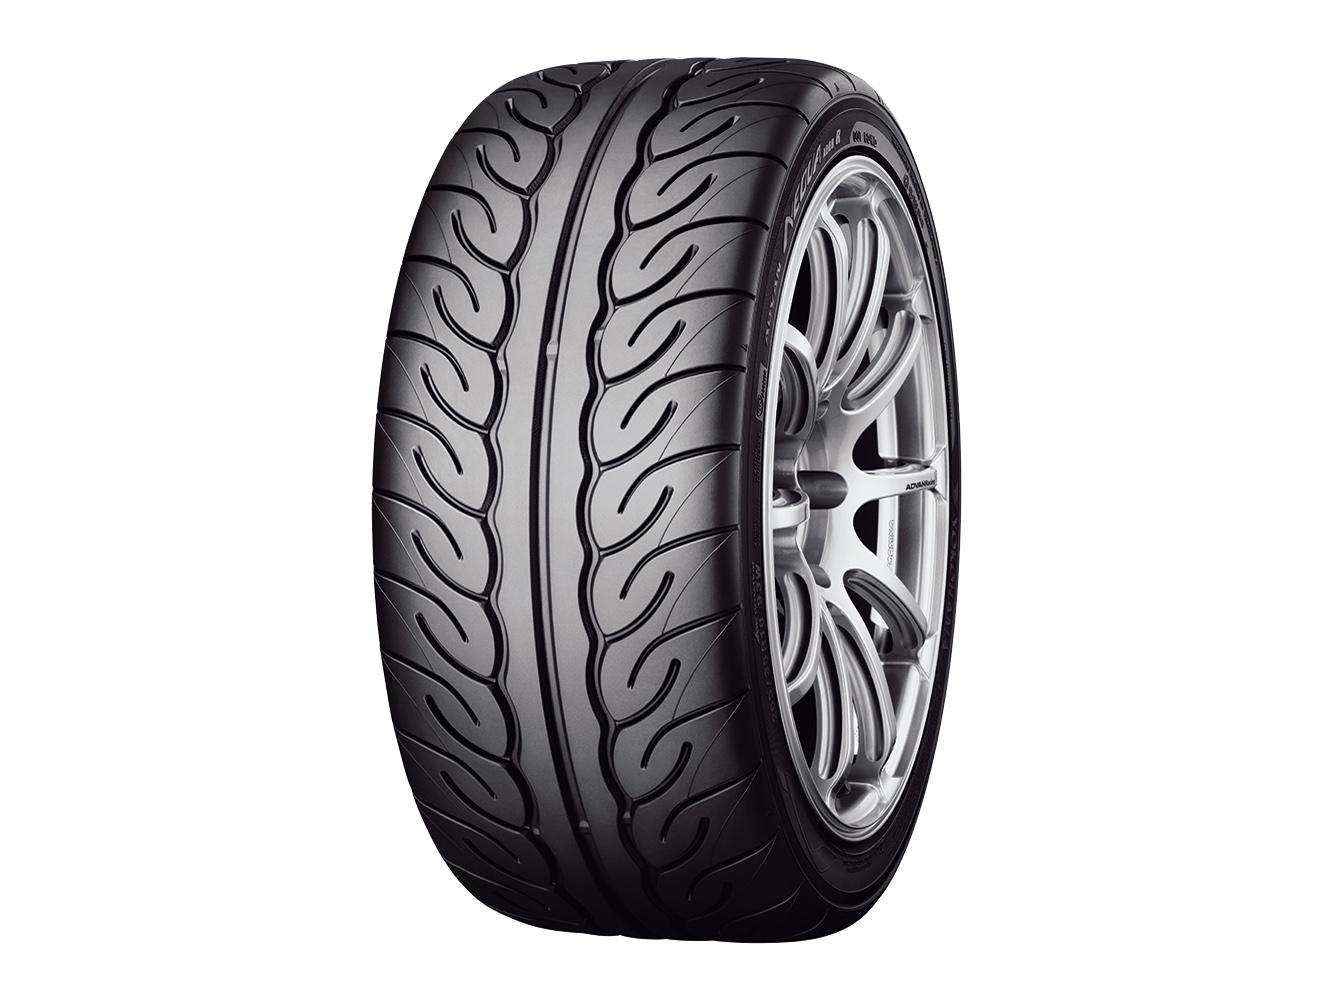 Yokohama ADVAN Neova AD08R 225/45/R16 Tyre